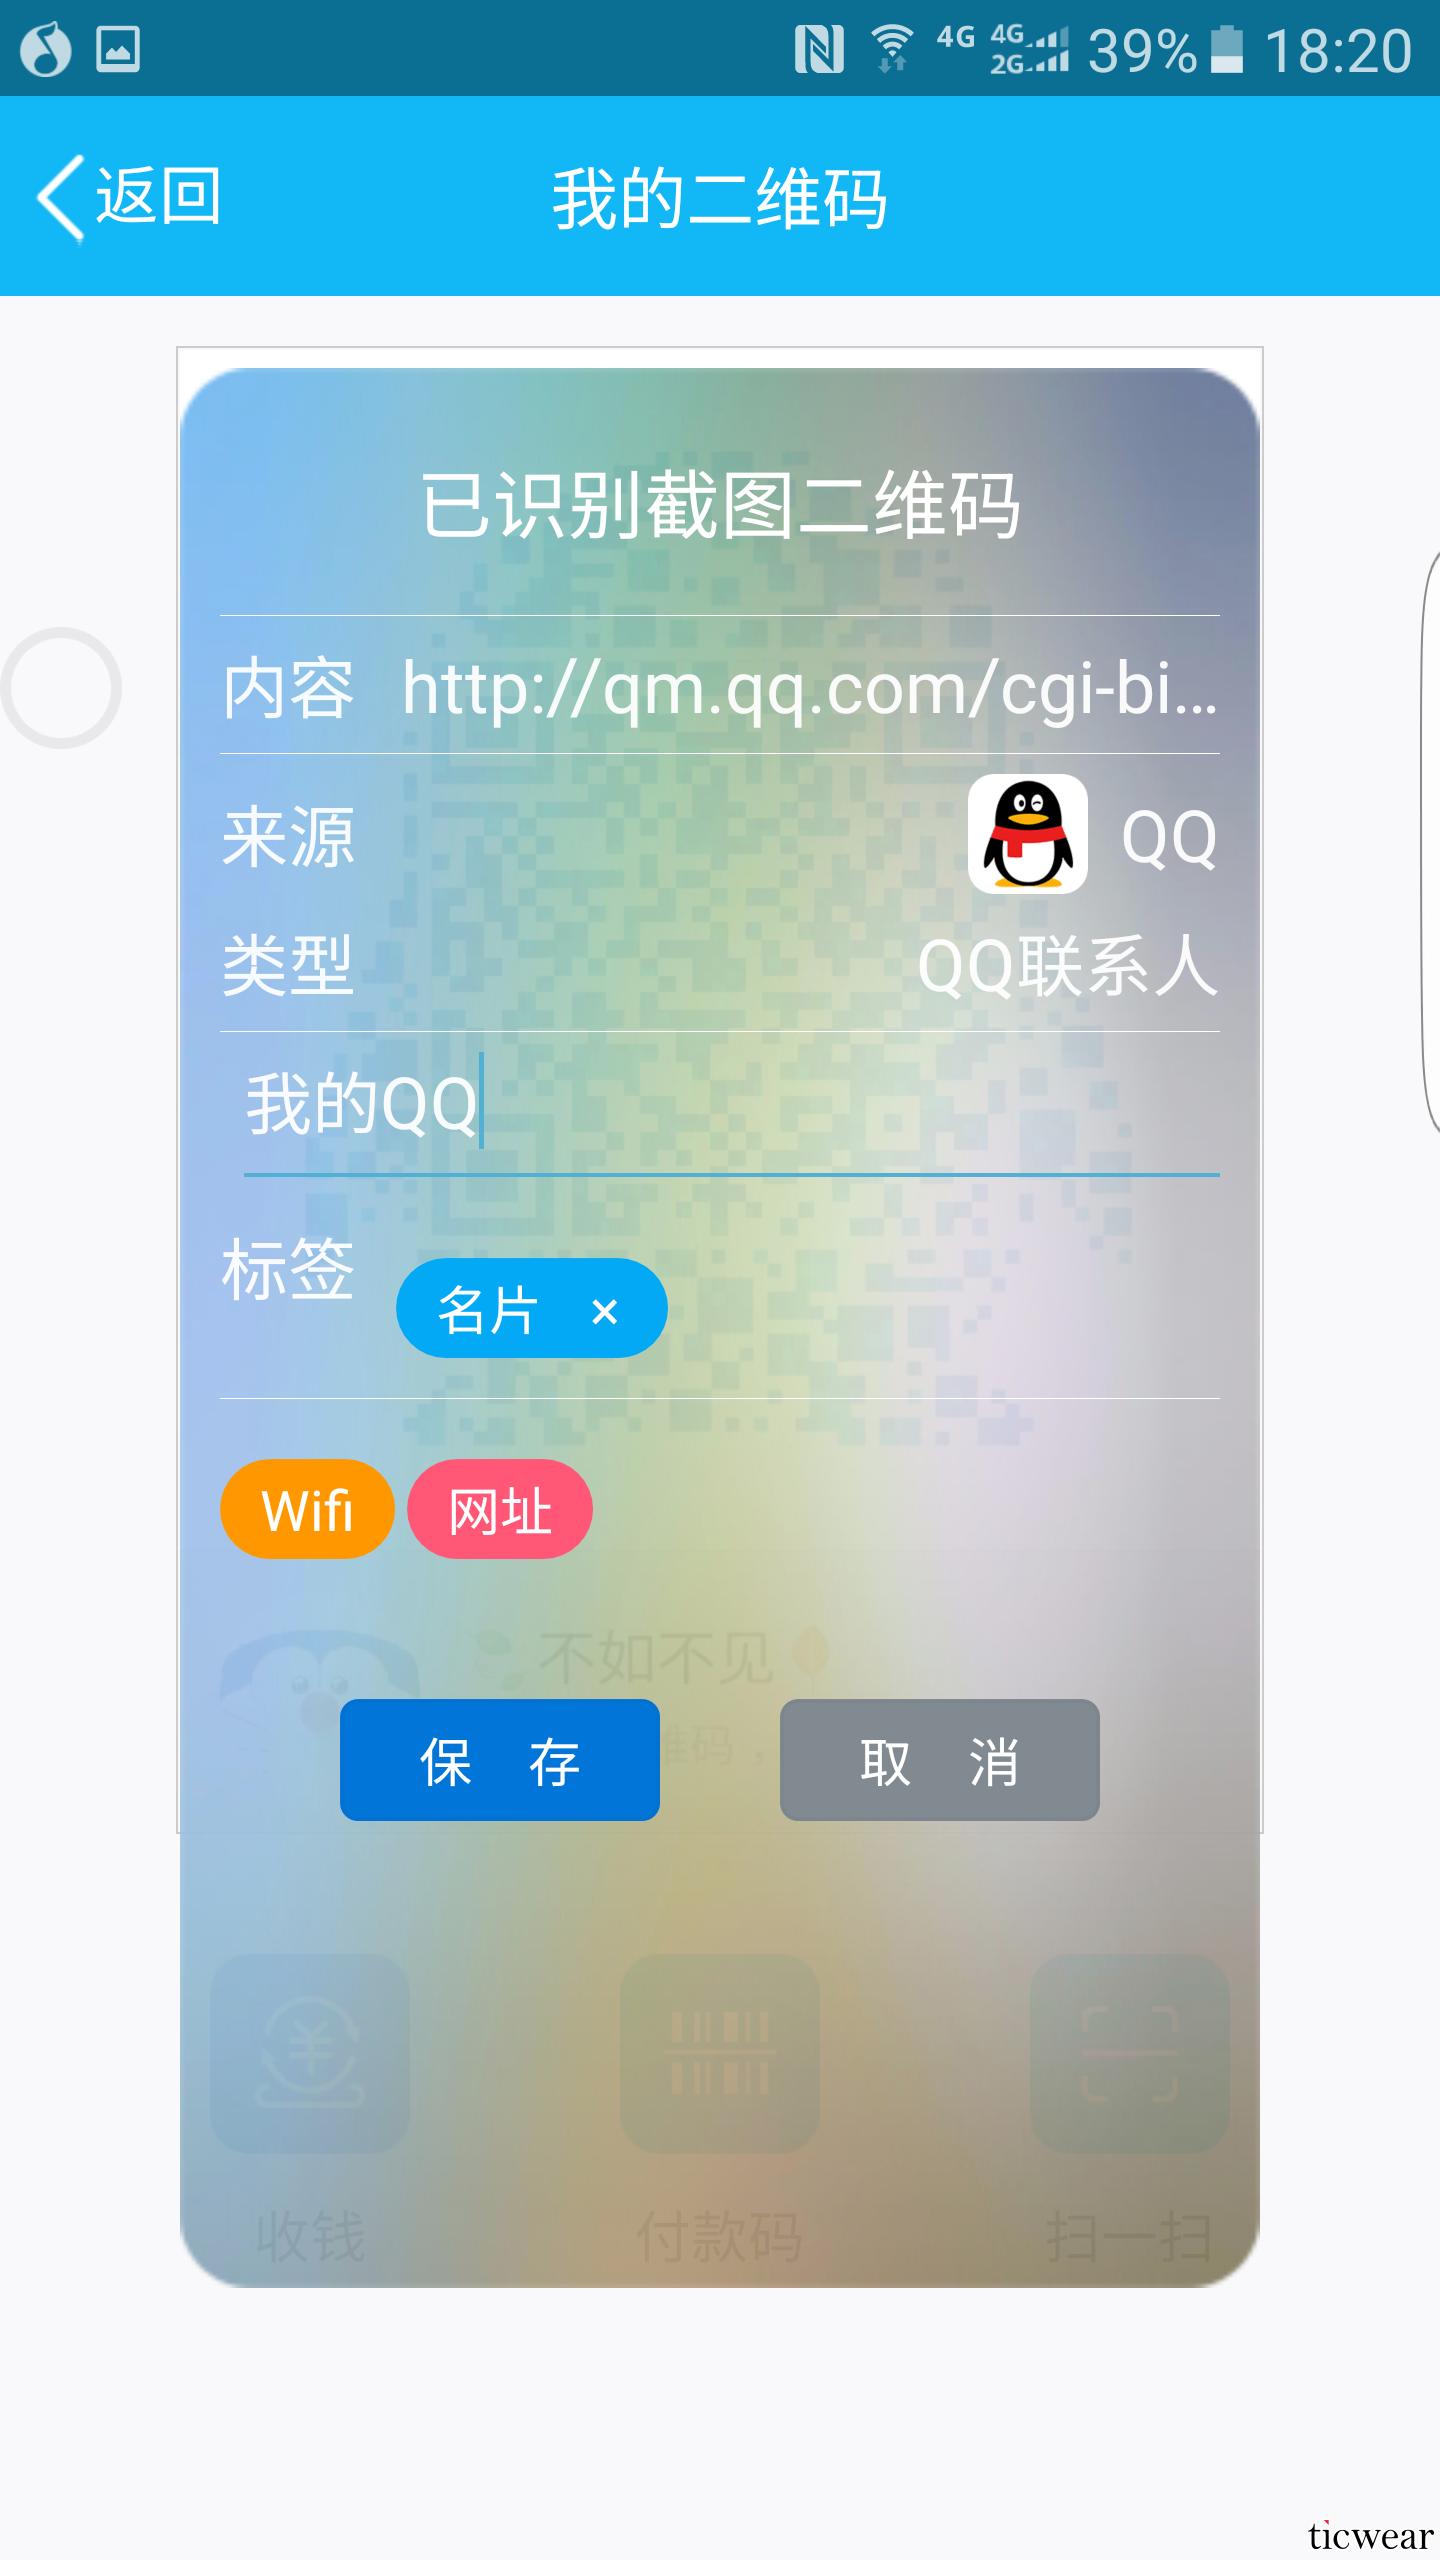 Screenshot_20160803-182016.png